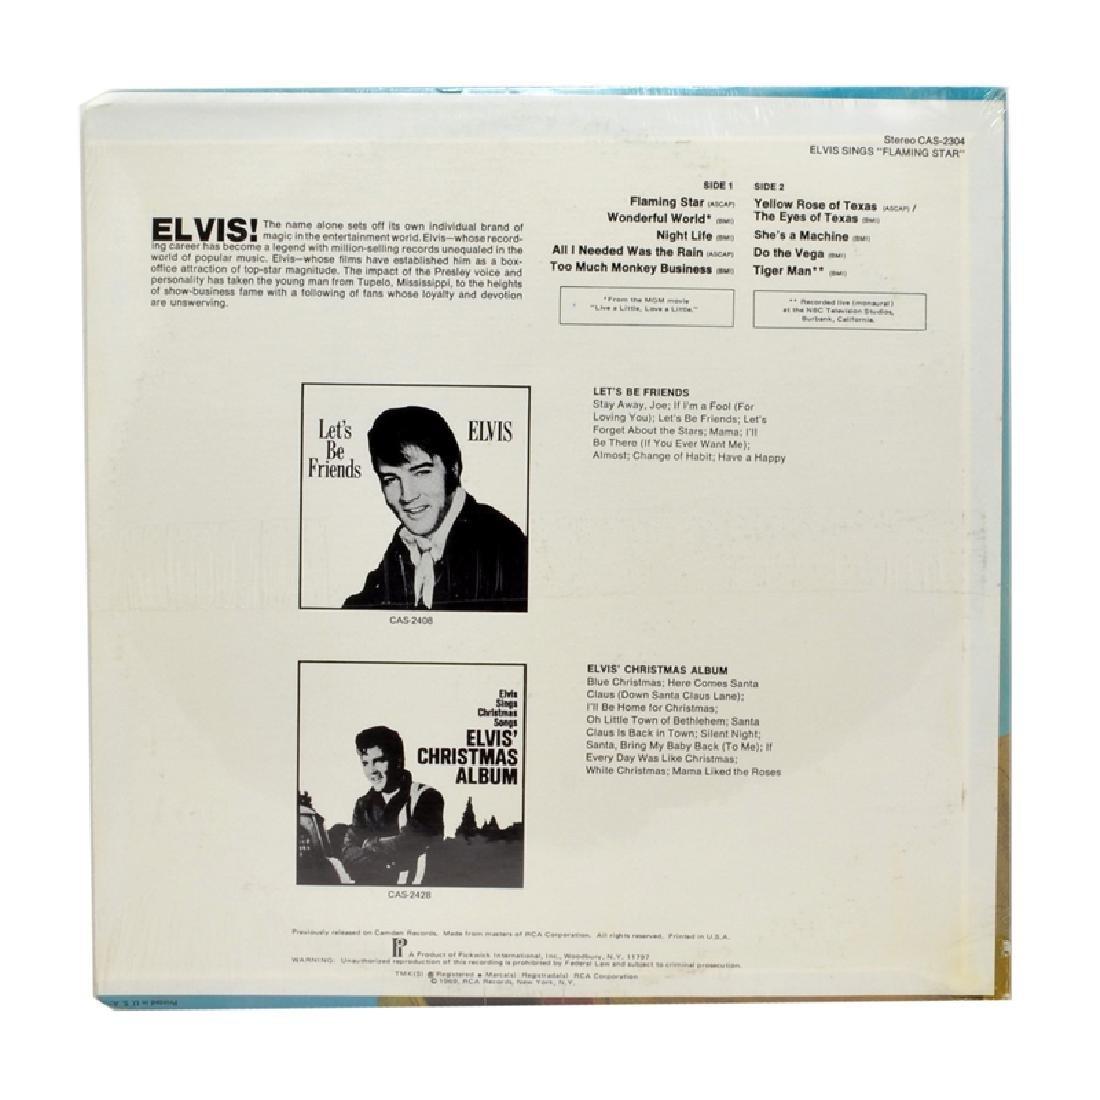 Rare Original Vintage Elvis Album (Unopen) - 2